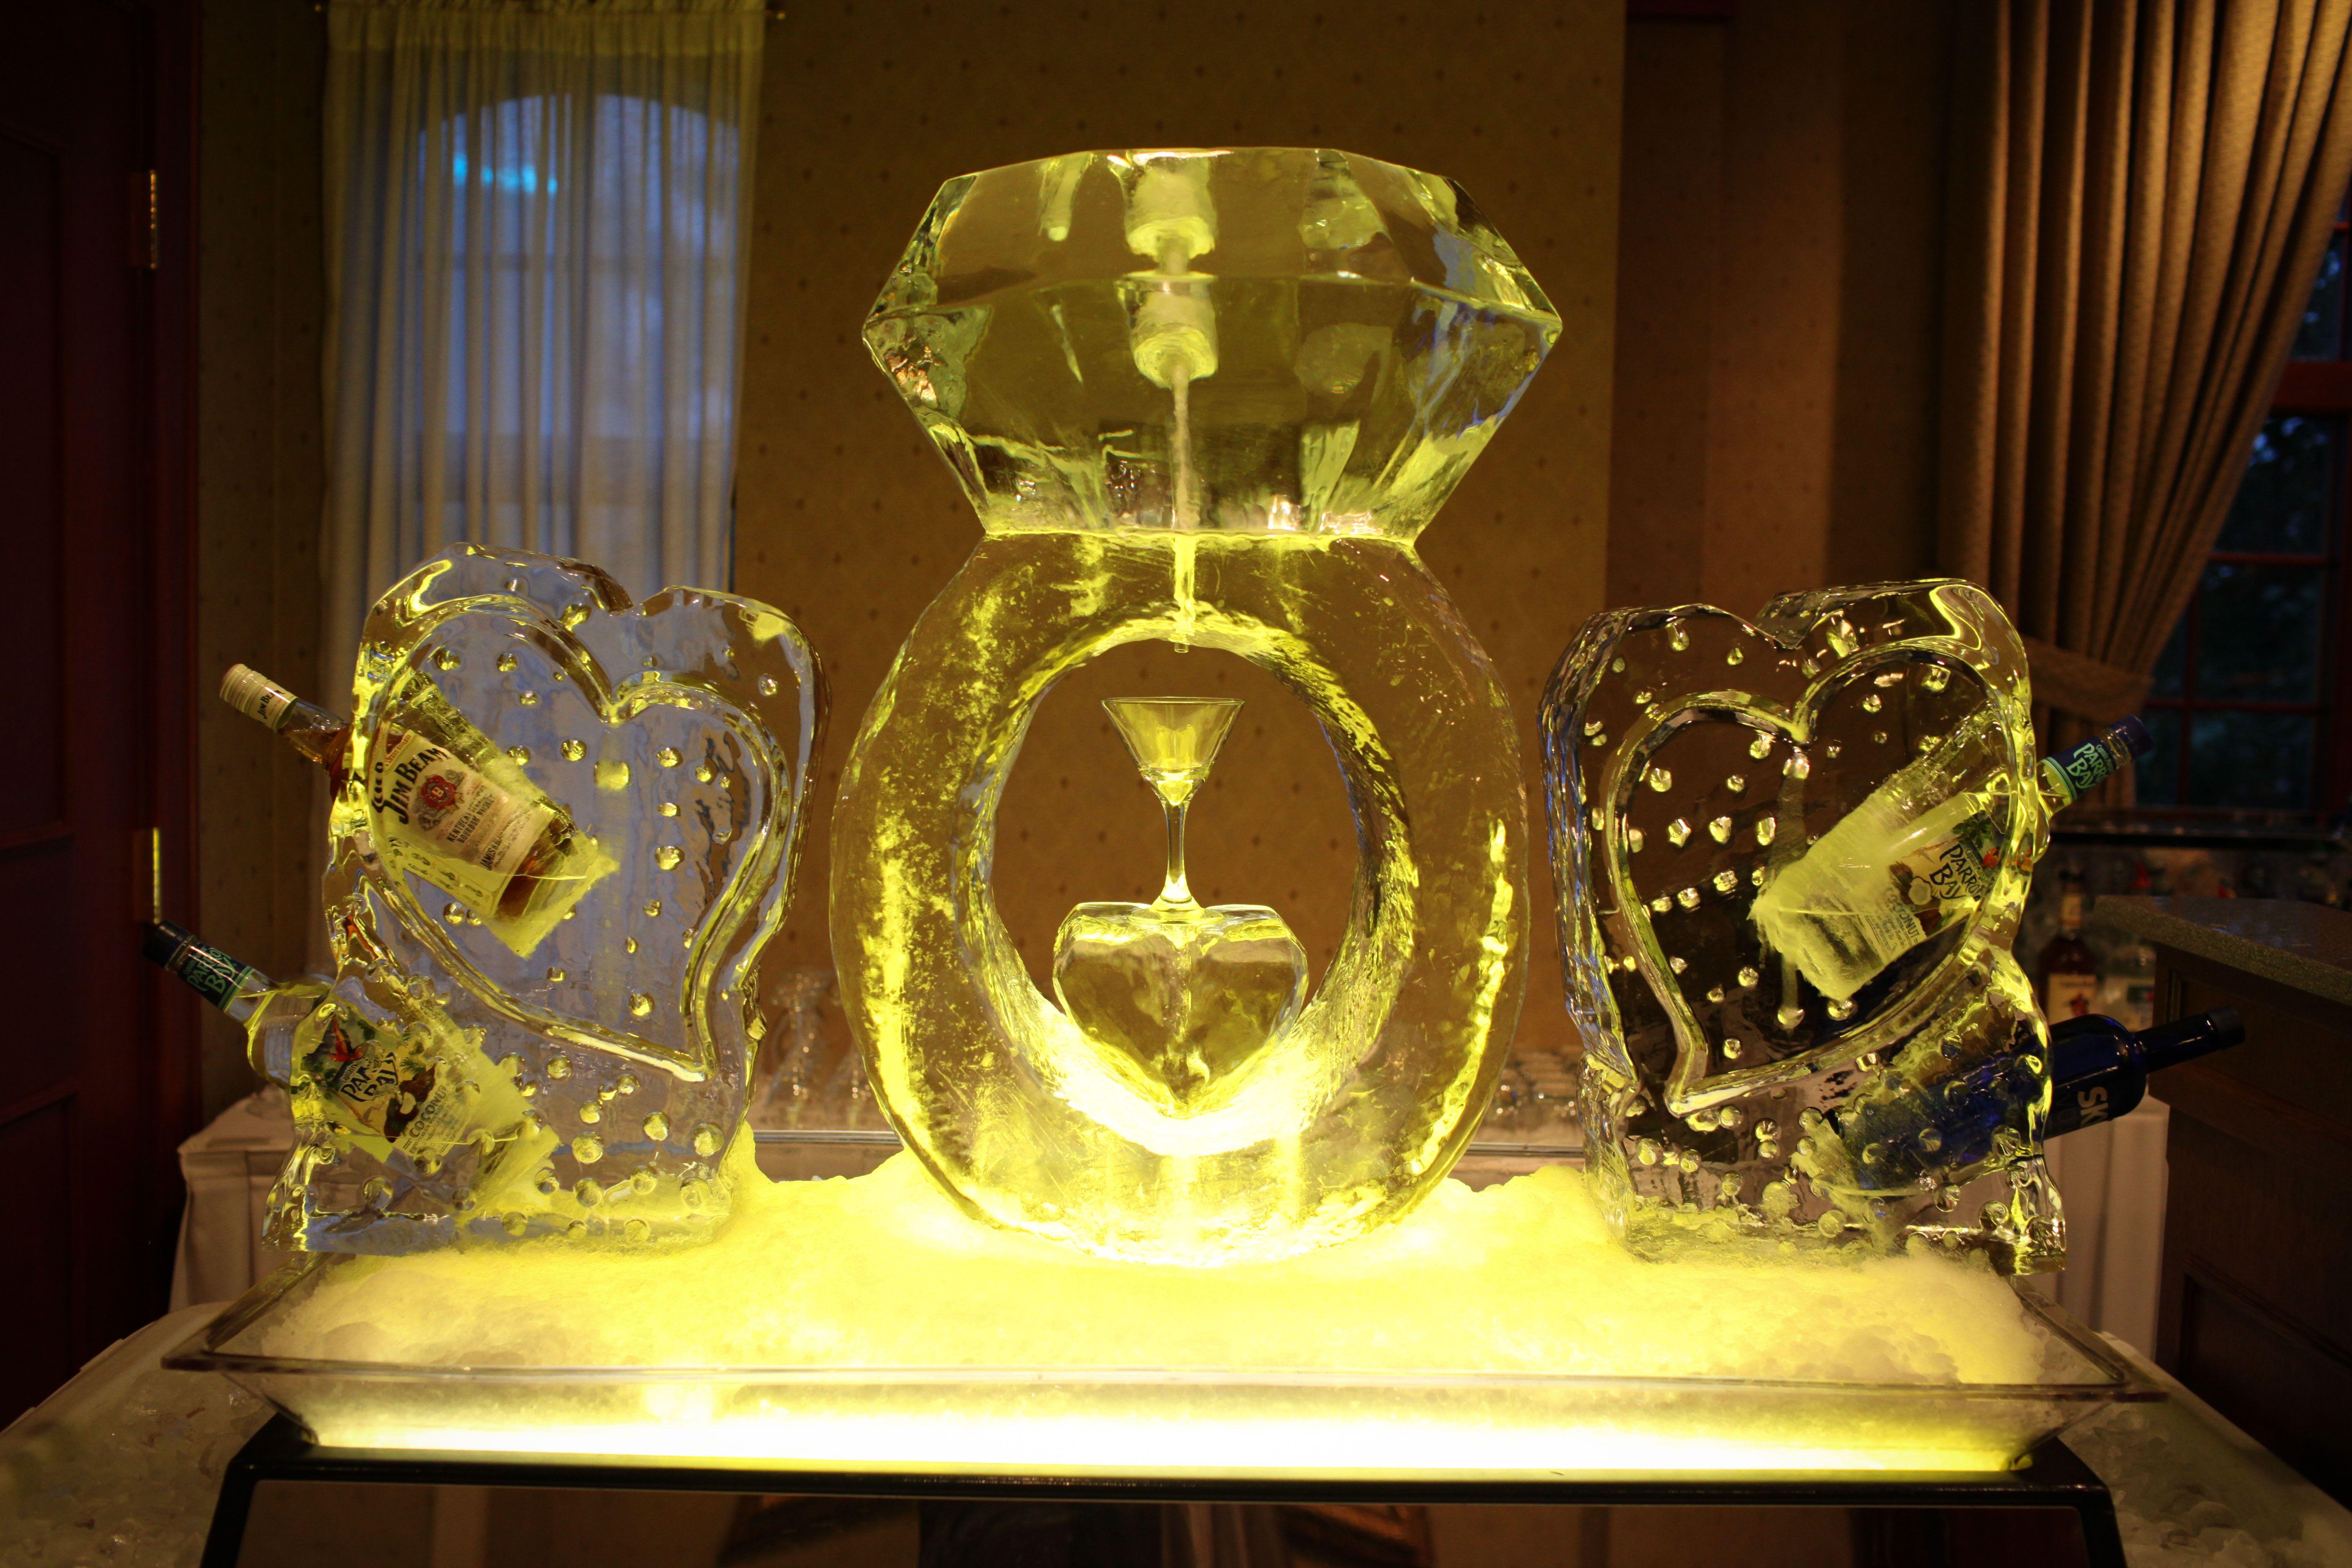 Turning Stone Ice Sculpture - Diamond Ring Martini Luge